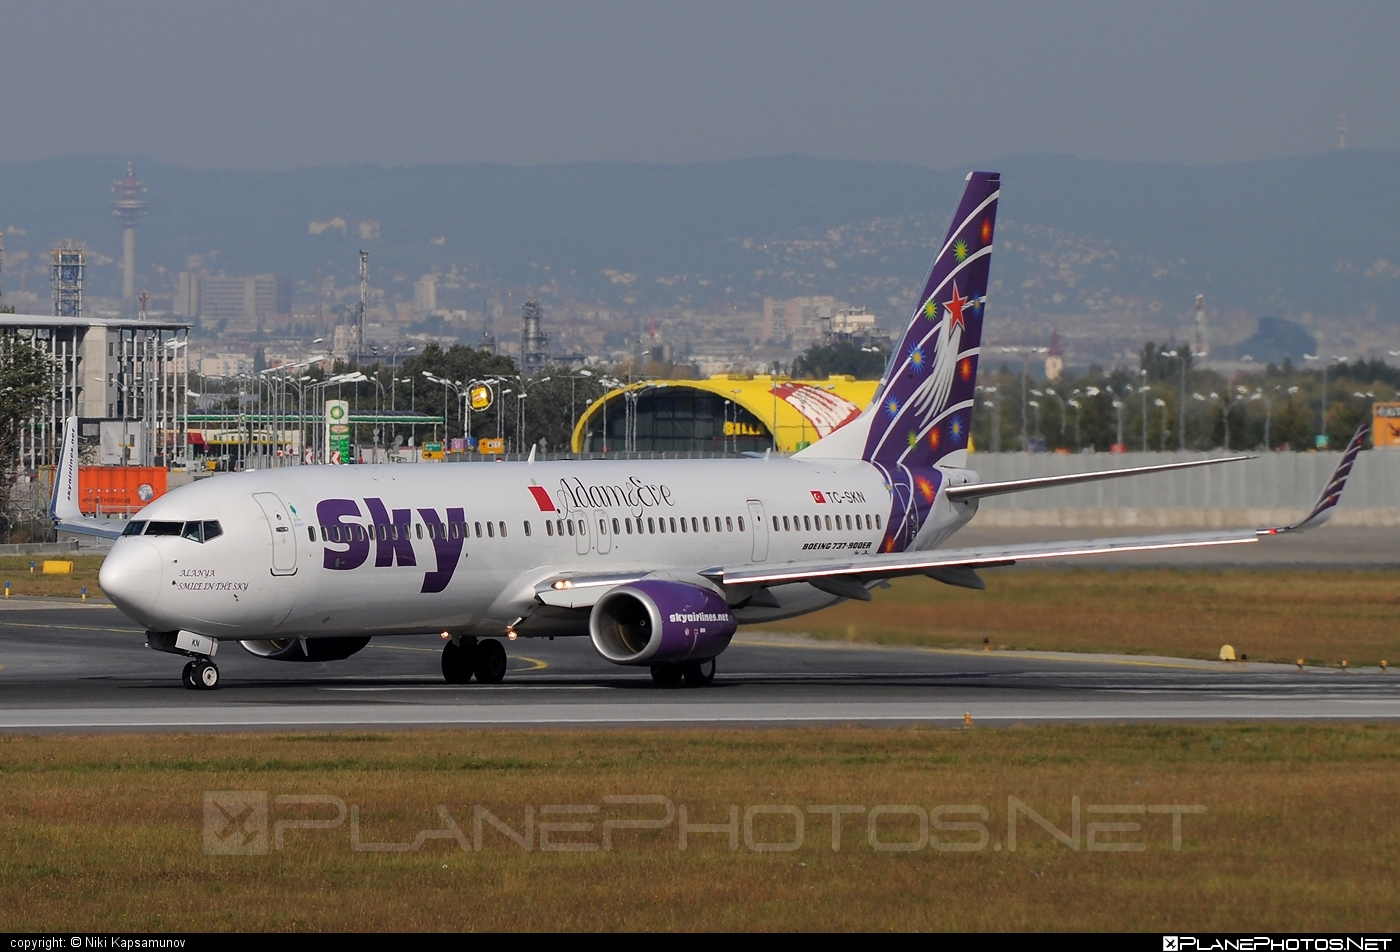 Boeing 737-900ER - TC-SKN operated by Sky Airlines #b737 #b737er #b737nextgen #b737ng #boeing #boeing737